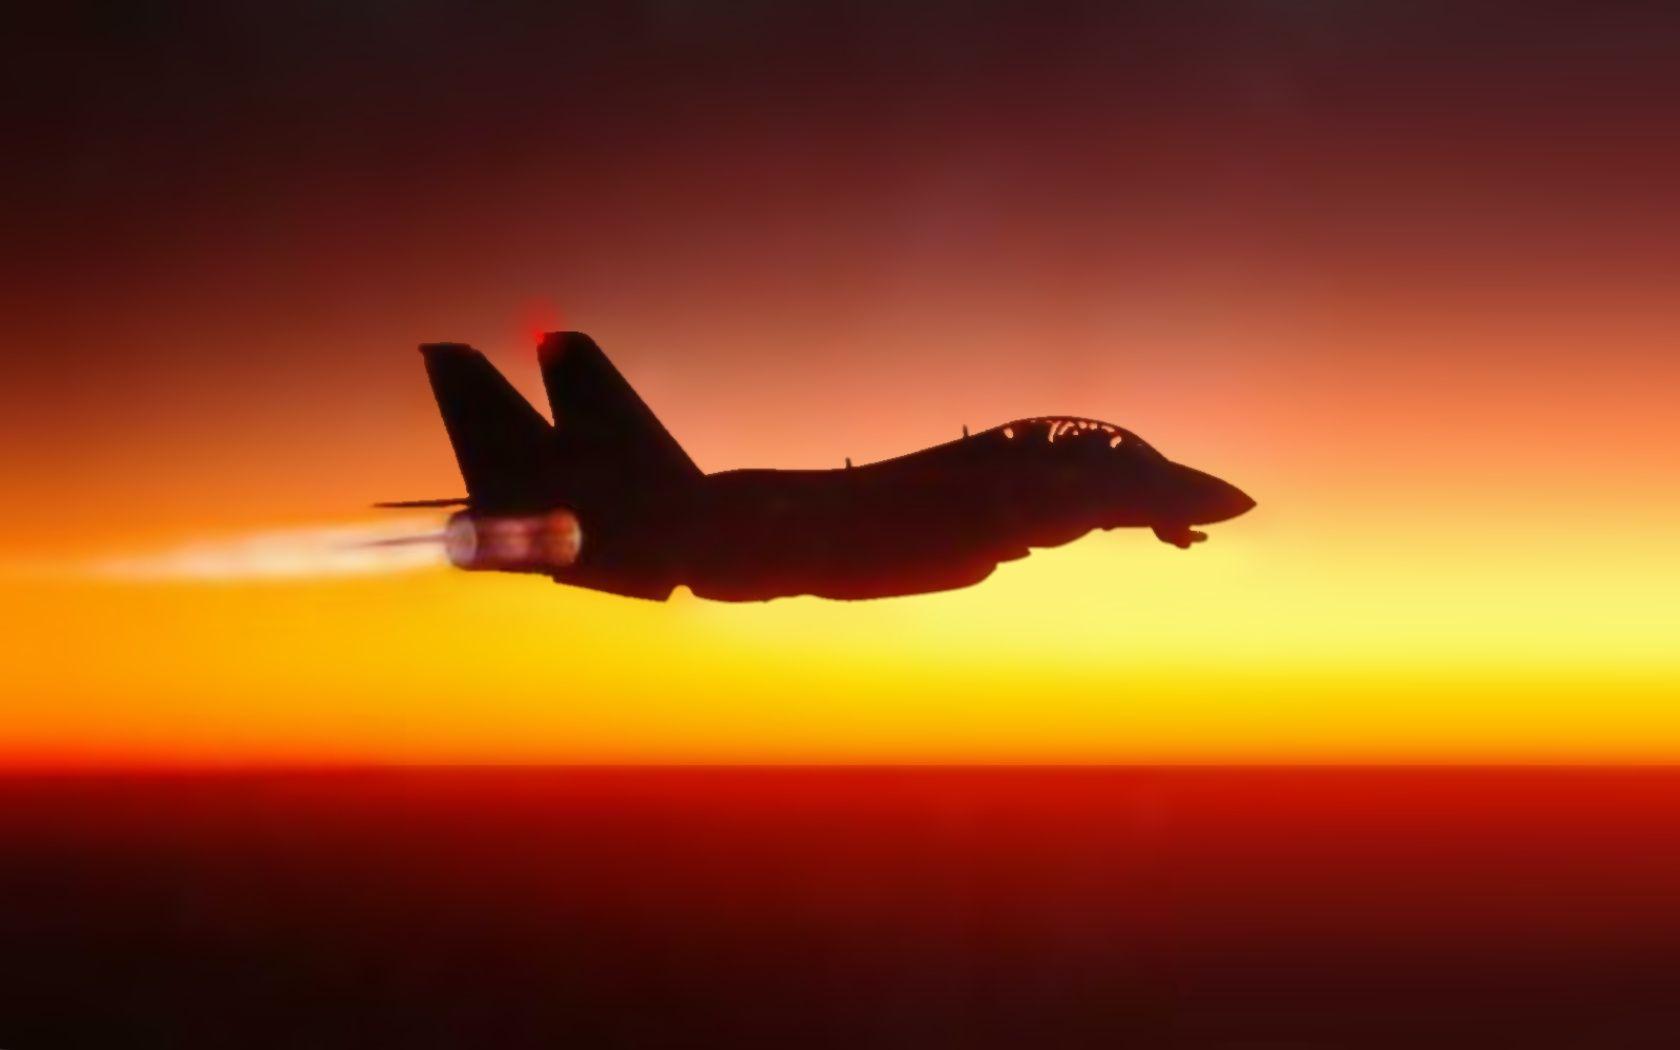 F14 tomcat sunset